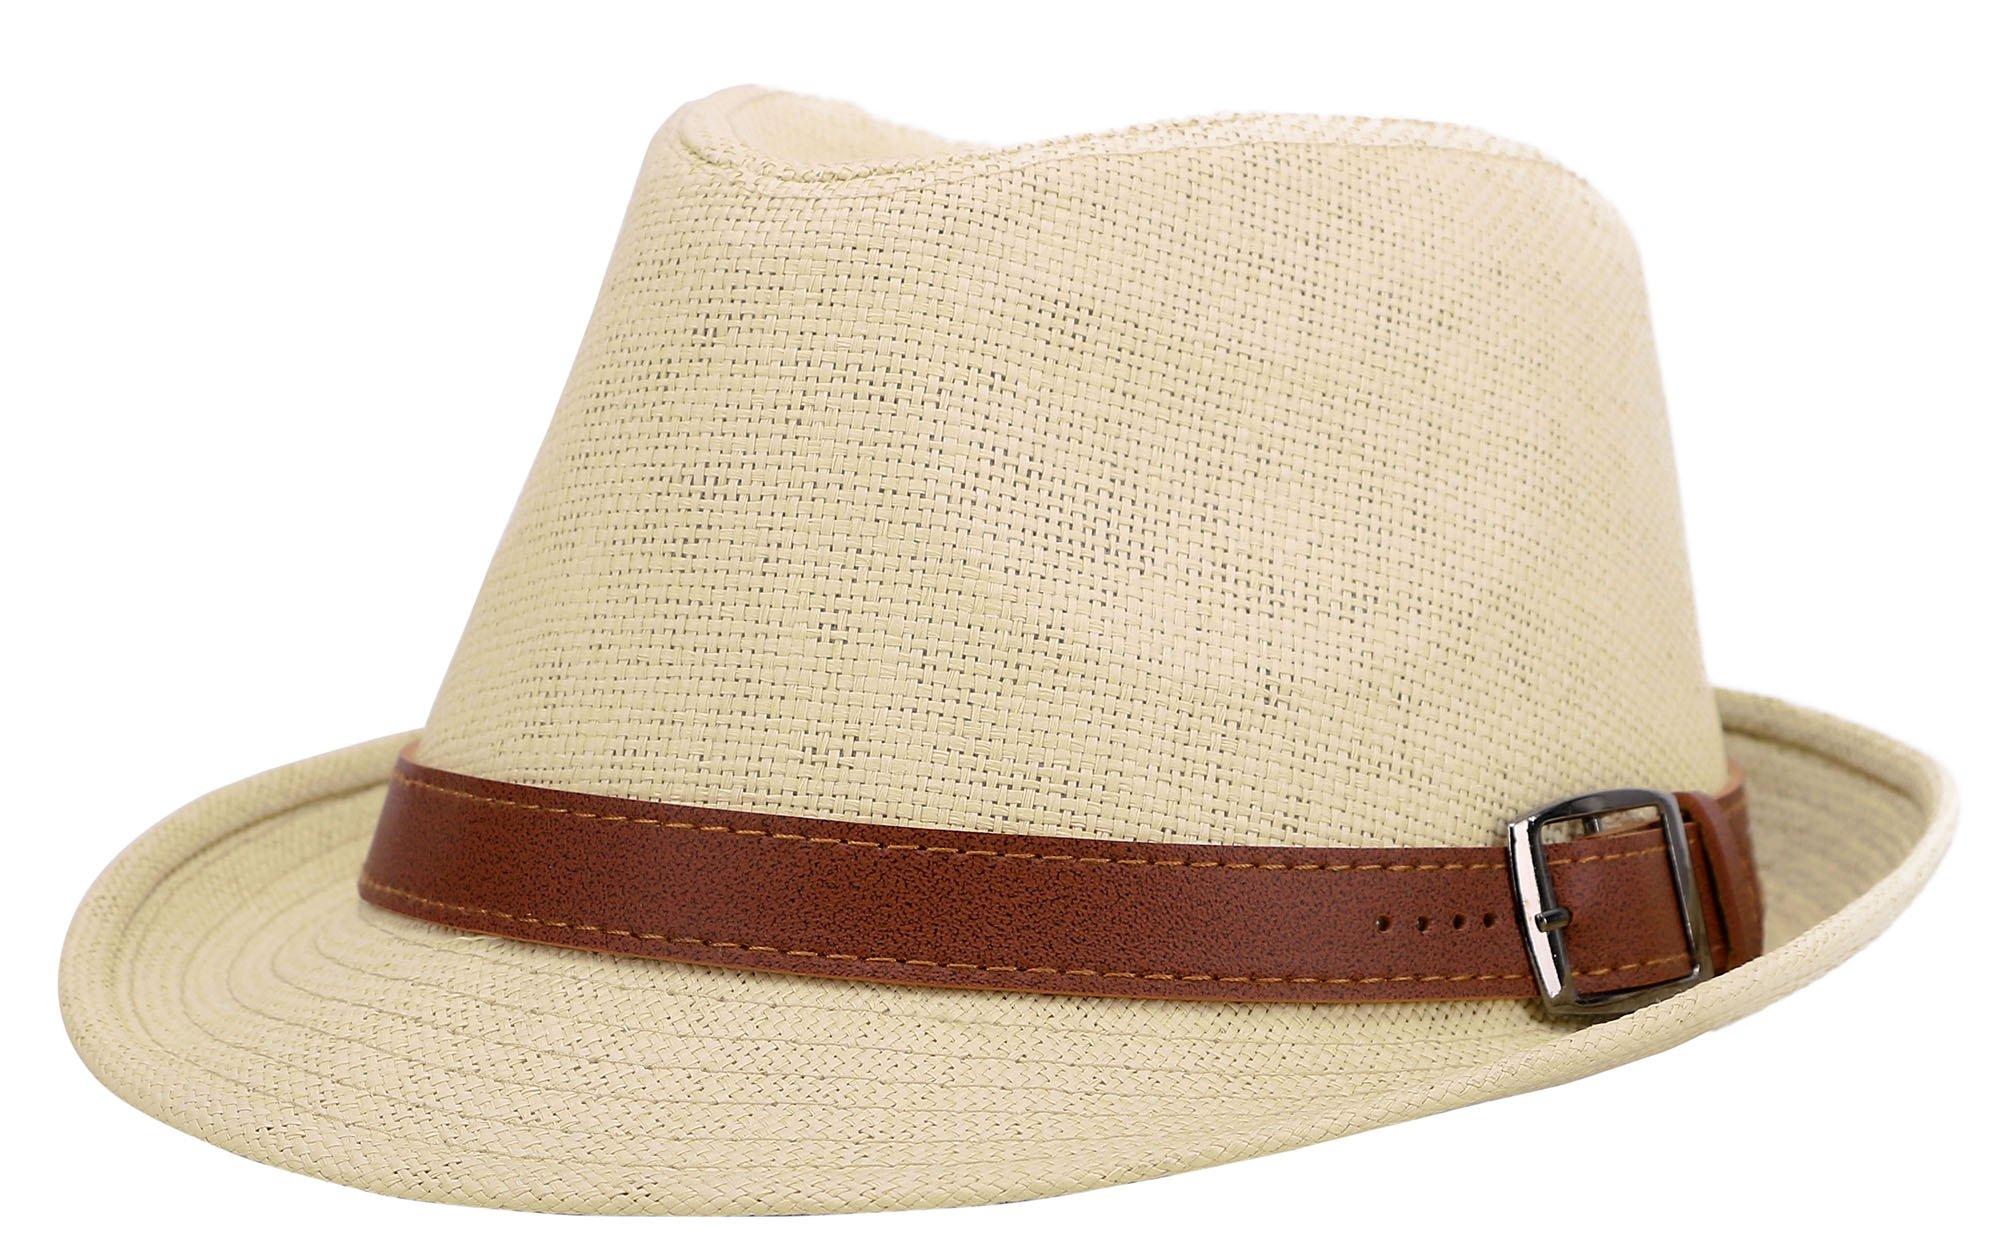 AbbyLexi Women's Summer Straw Panama Triby Sun Fedora Hat w/Belt, Natural, LXL